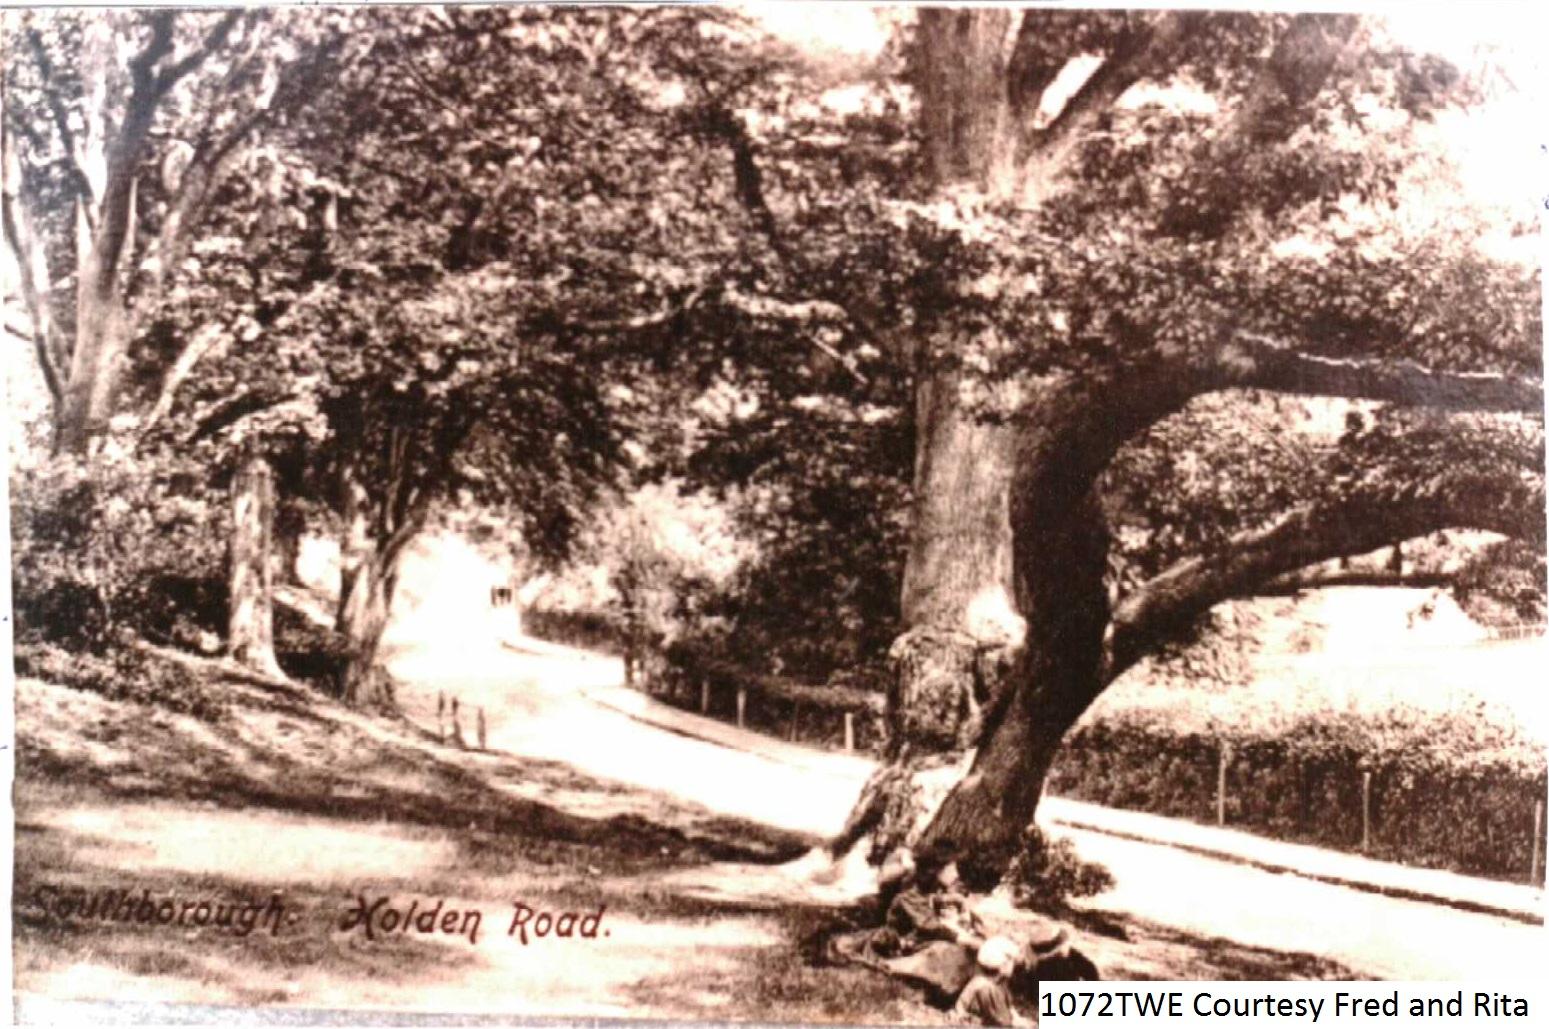 Holden Road